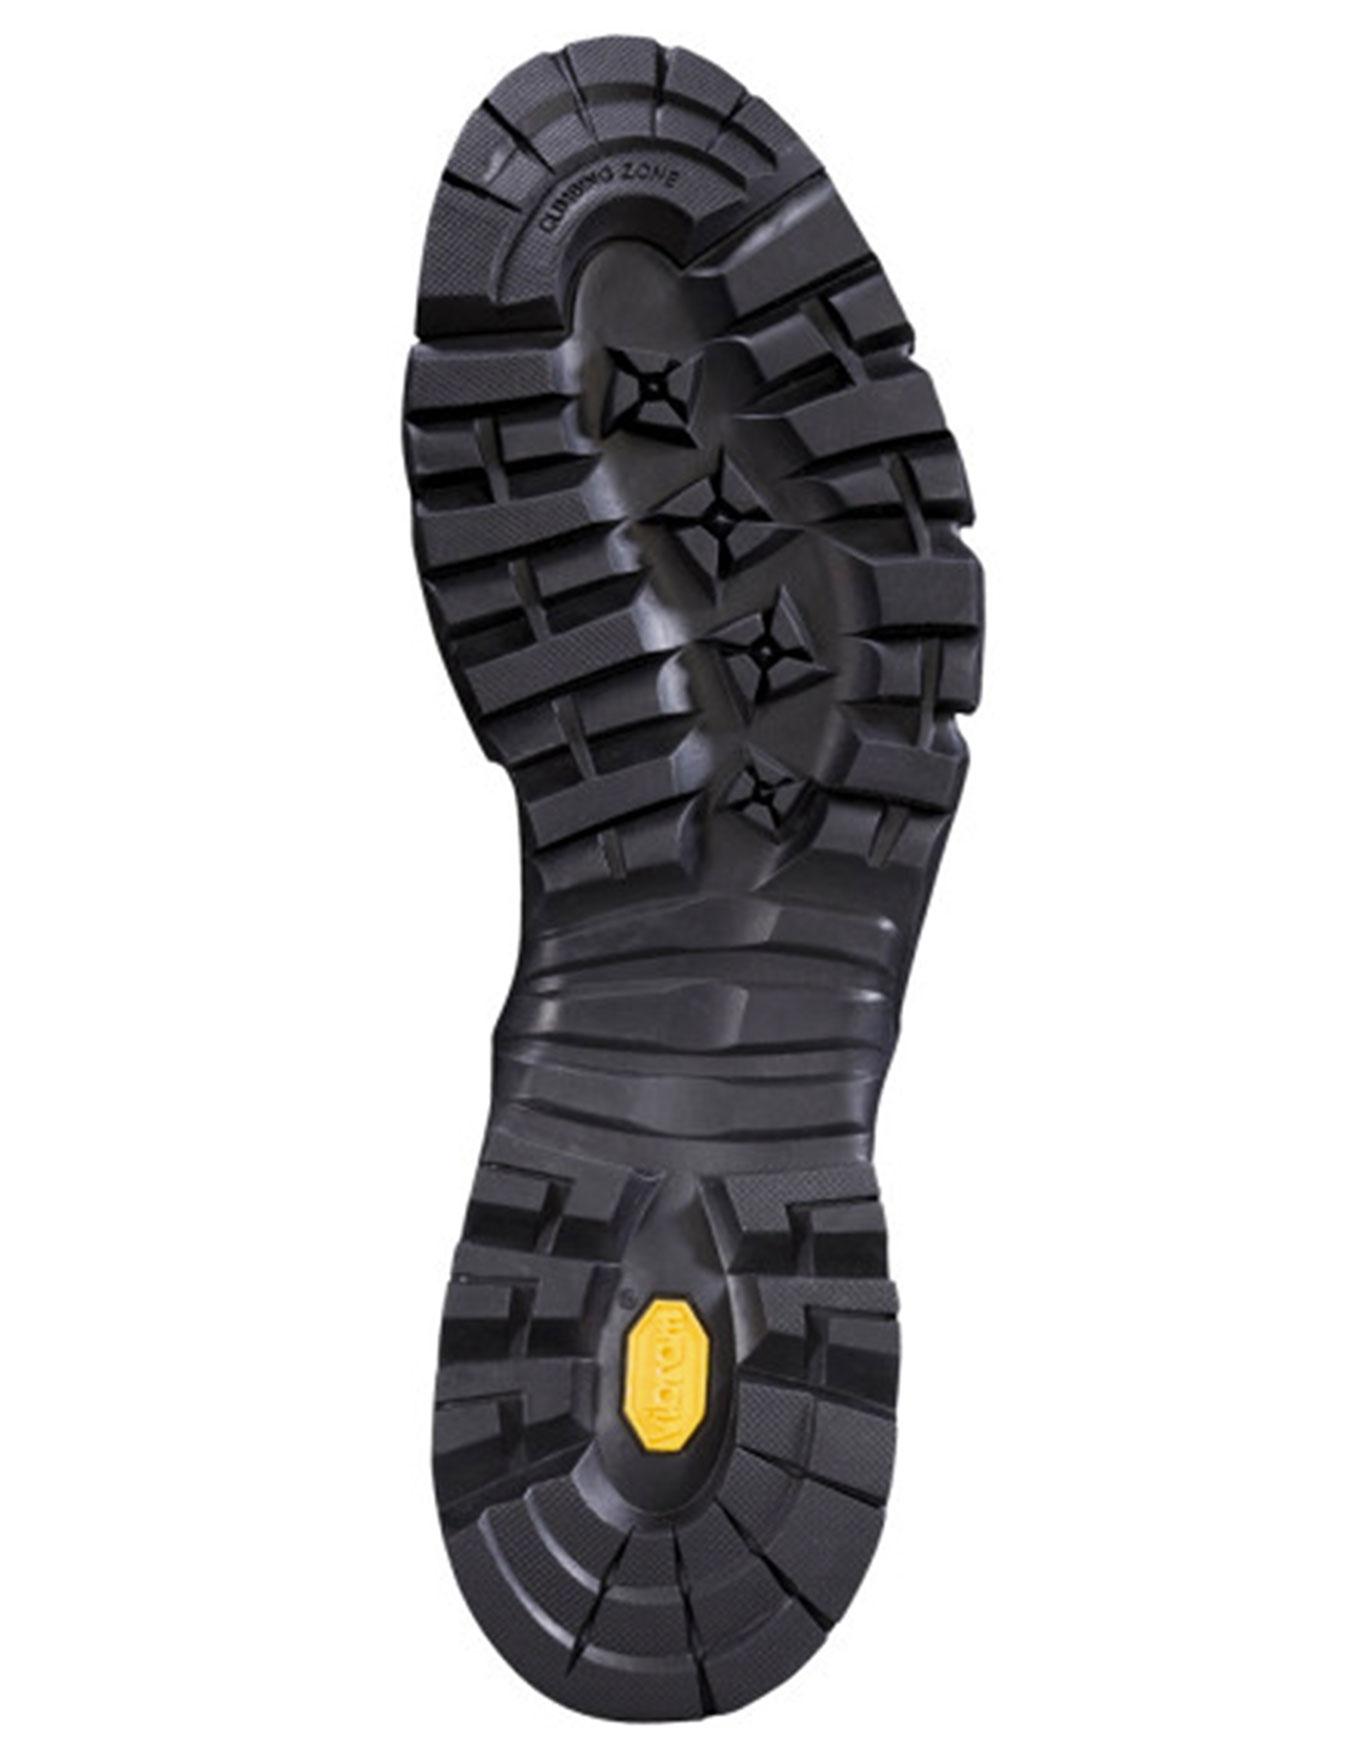 9bfa5365e9ac ws alp trainer mid gtx black out agata-configurable-salewa-sale00275 1.jpg